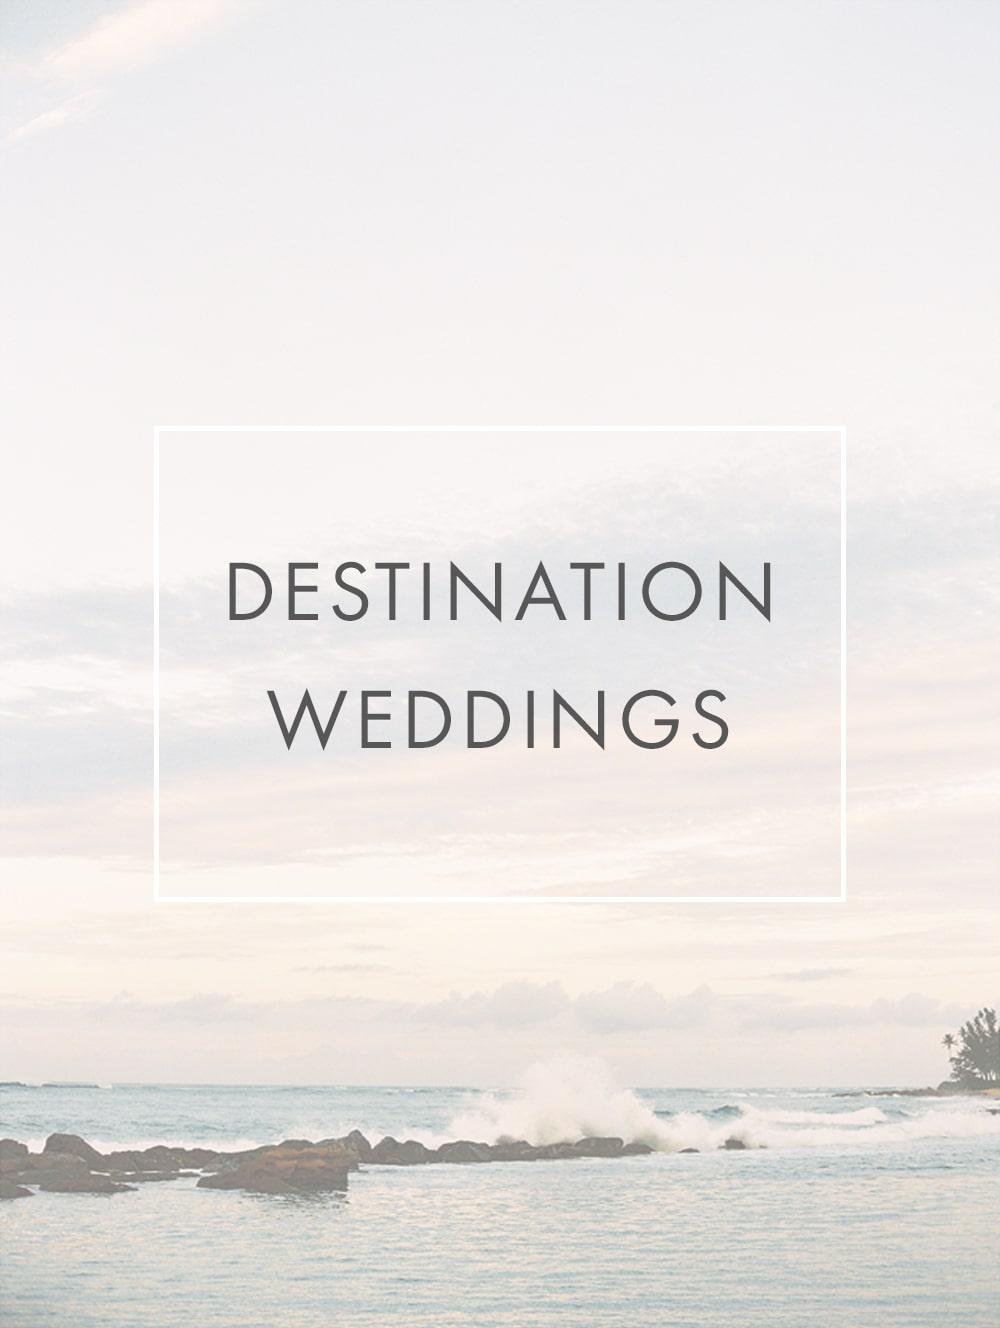 Destination_Weddings-mobile-min.jpg